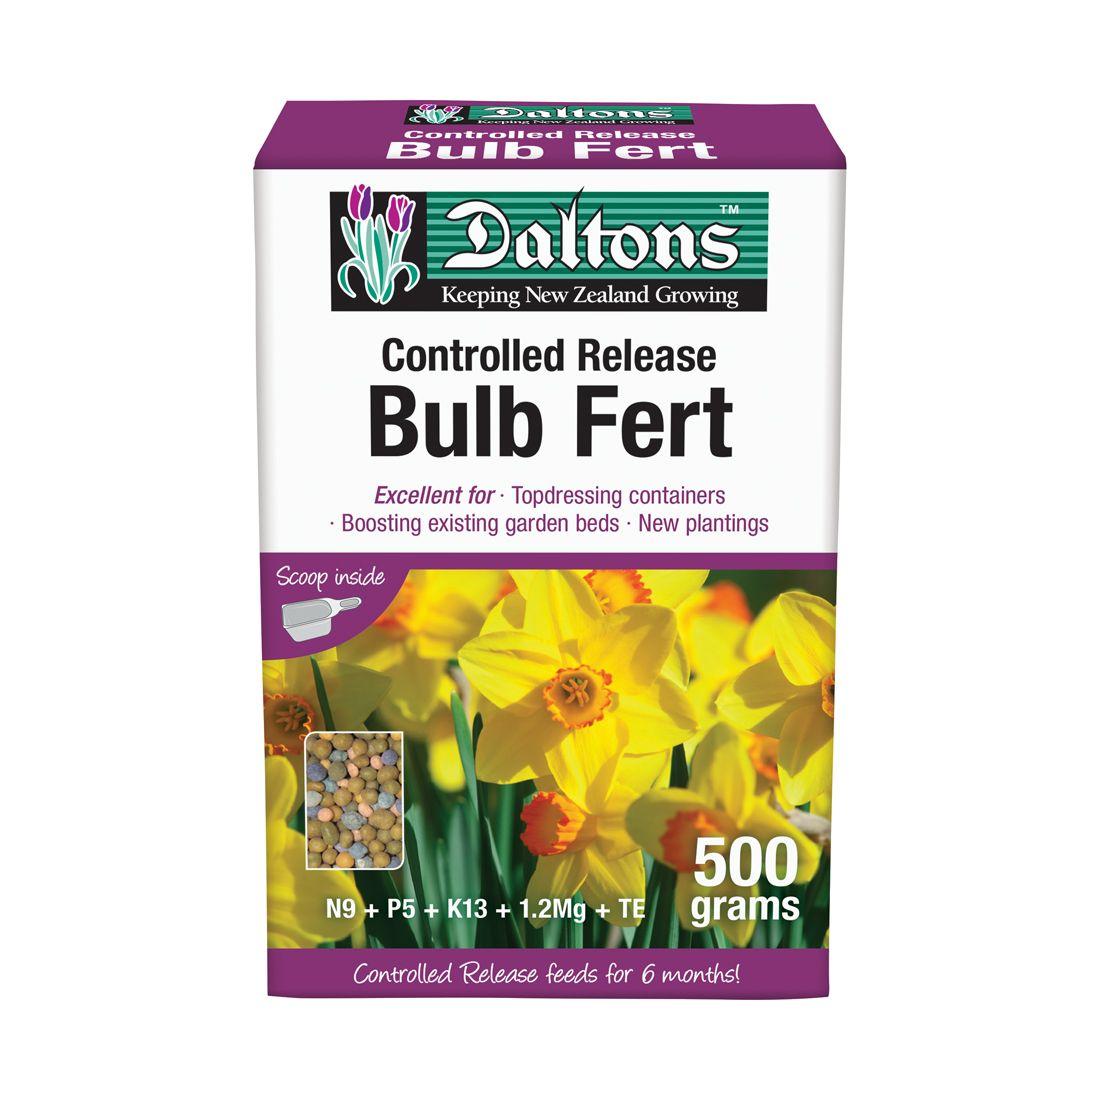 Bulb Fertilizer Controlled Release 500g Box